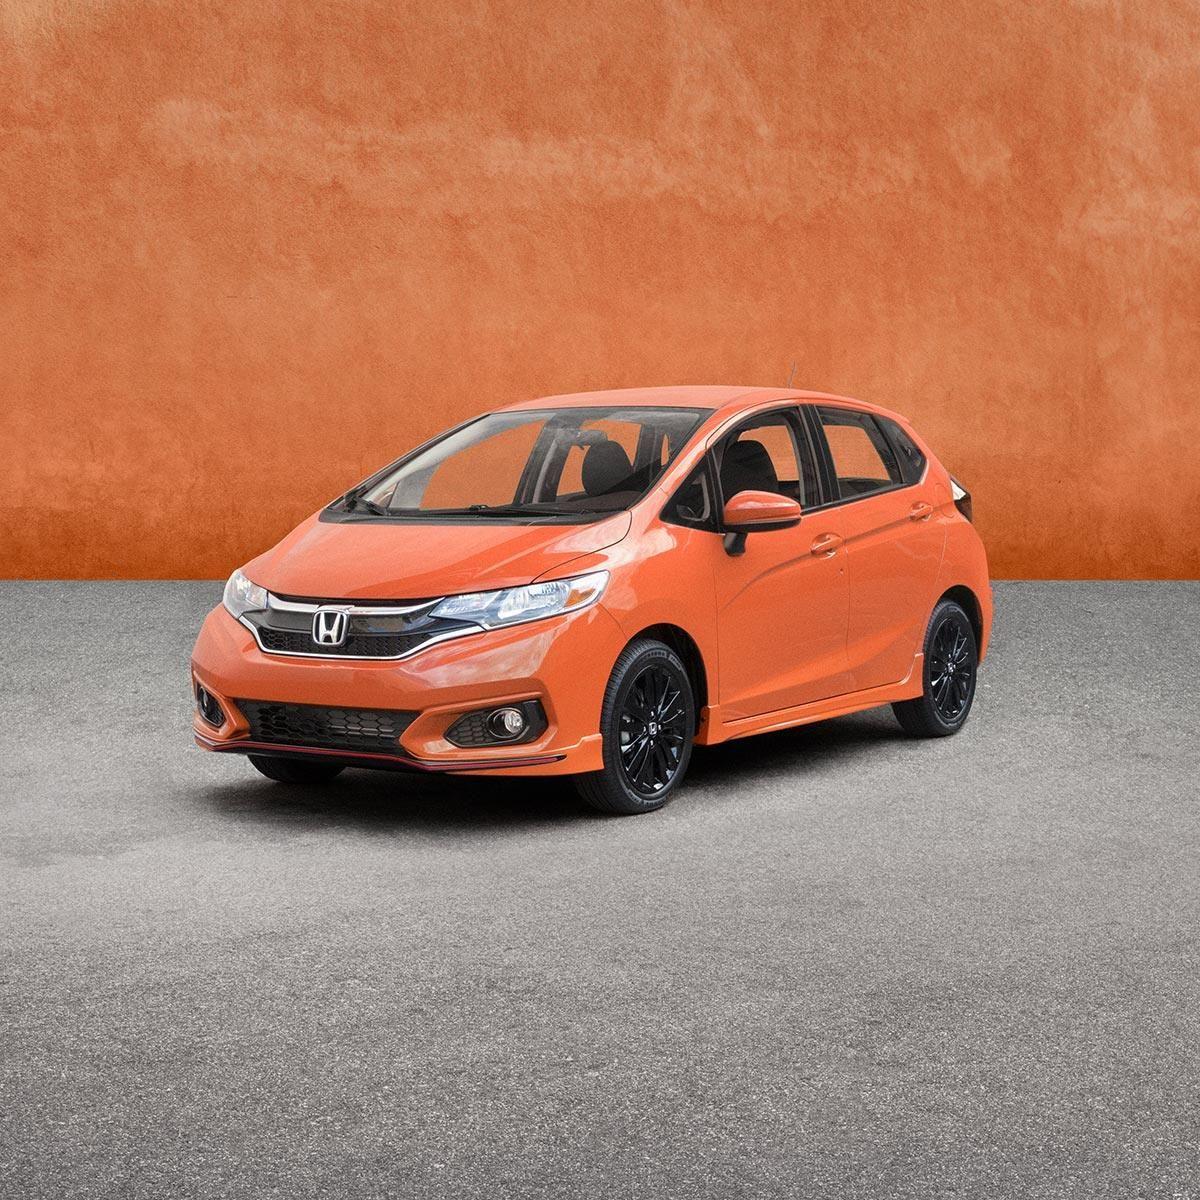 Honda Dealer Albany Ny Honda Fit Honda Fit For Sale Honda